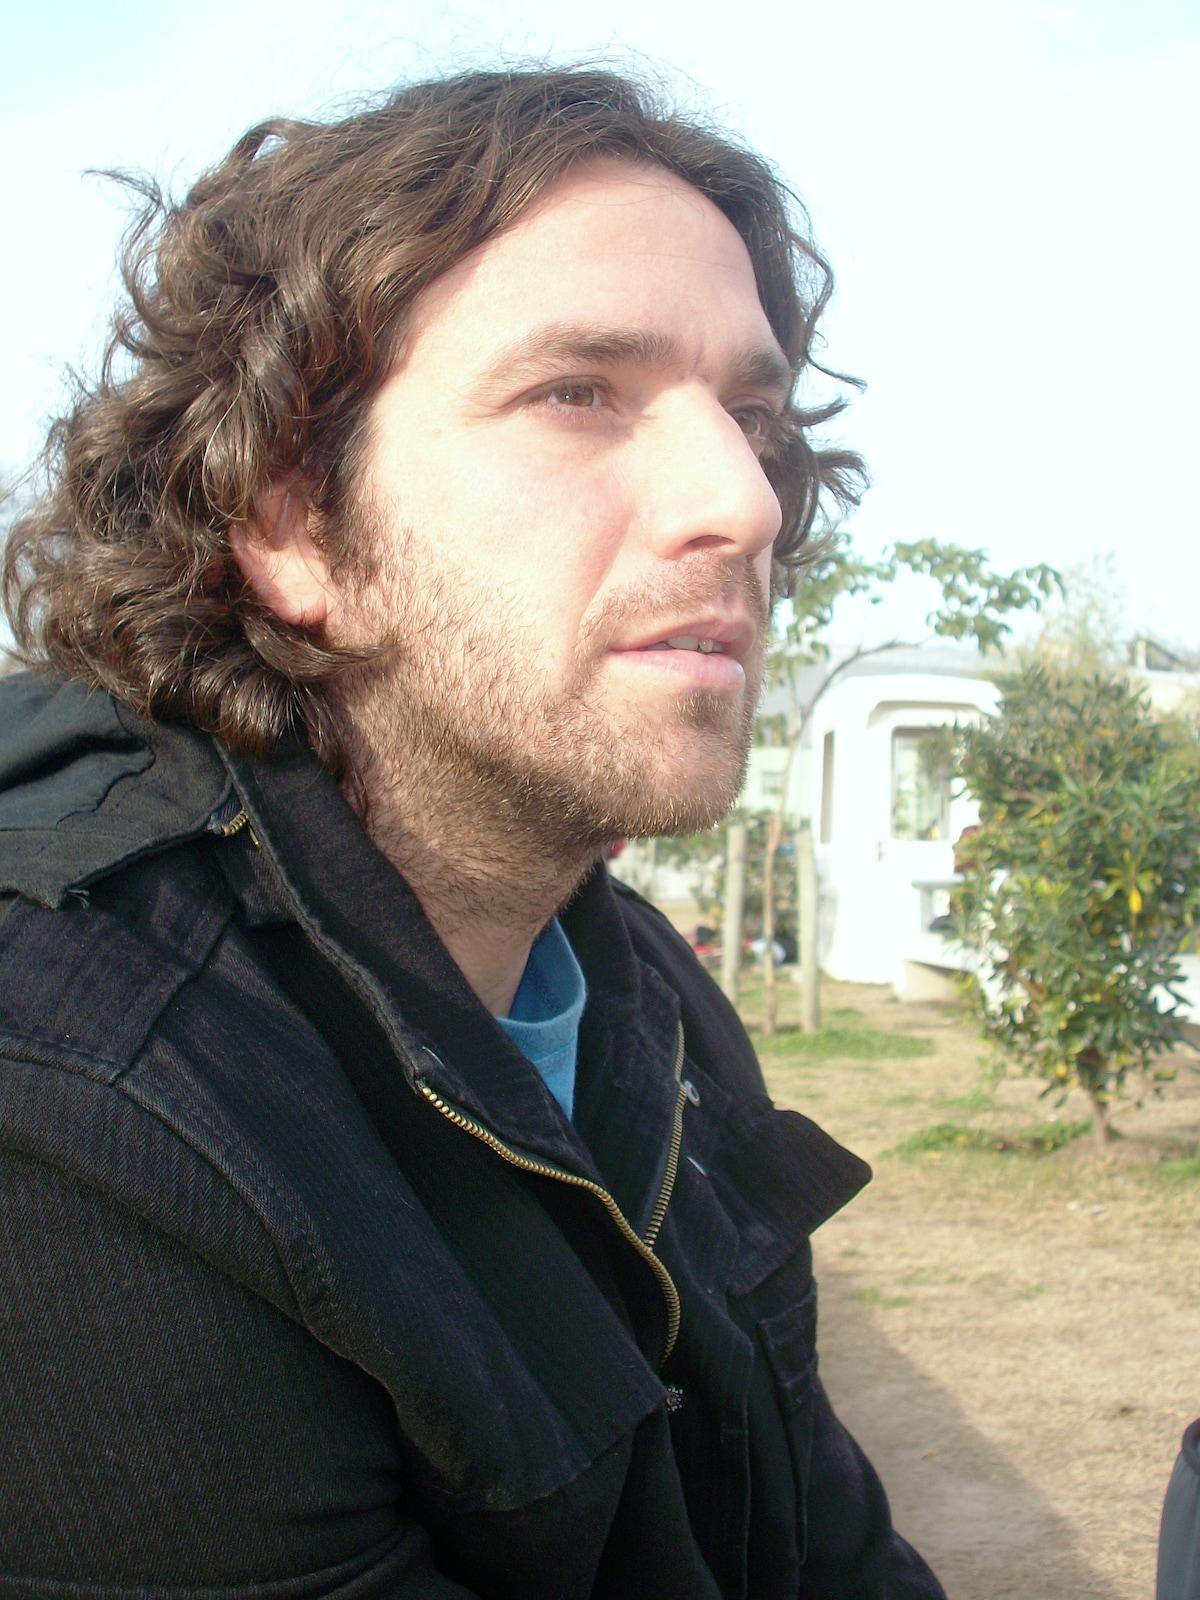 Manuel from Punta del Este